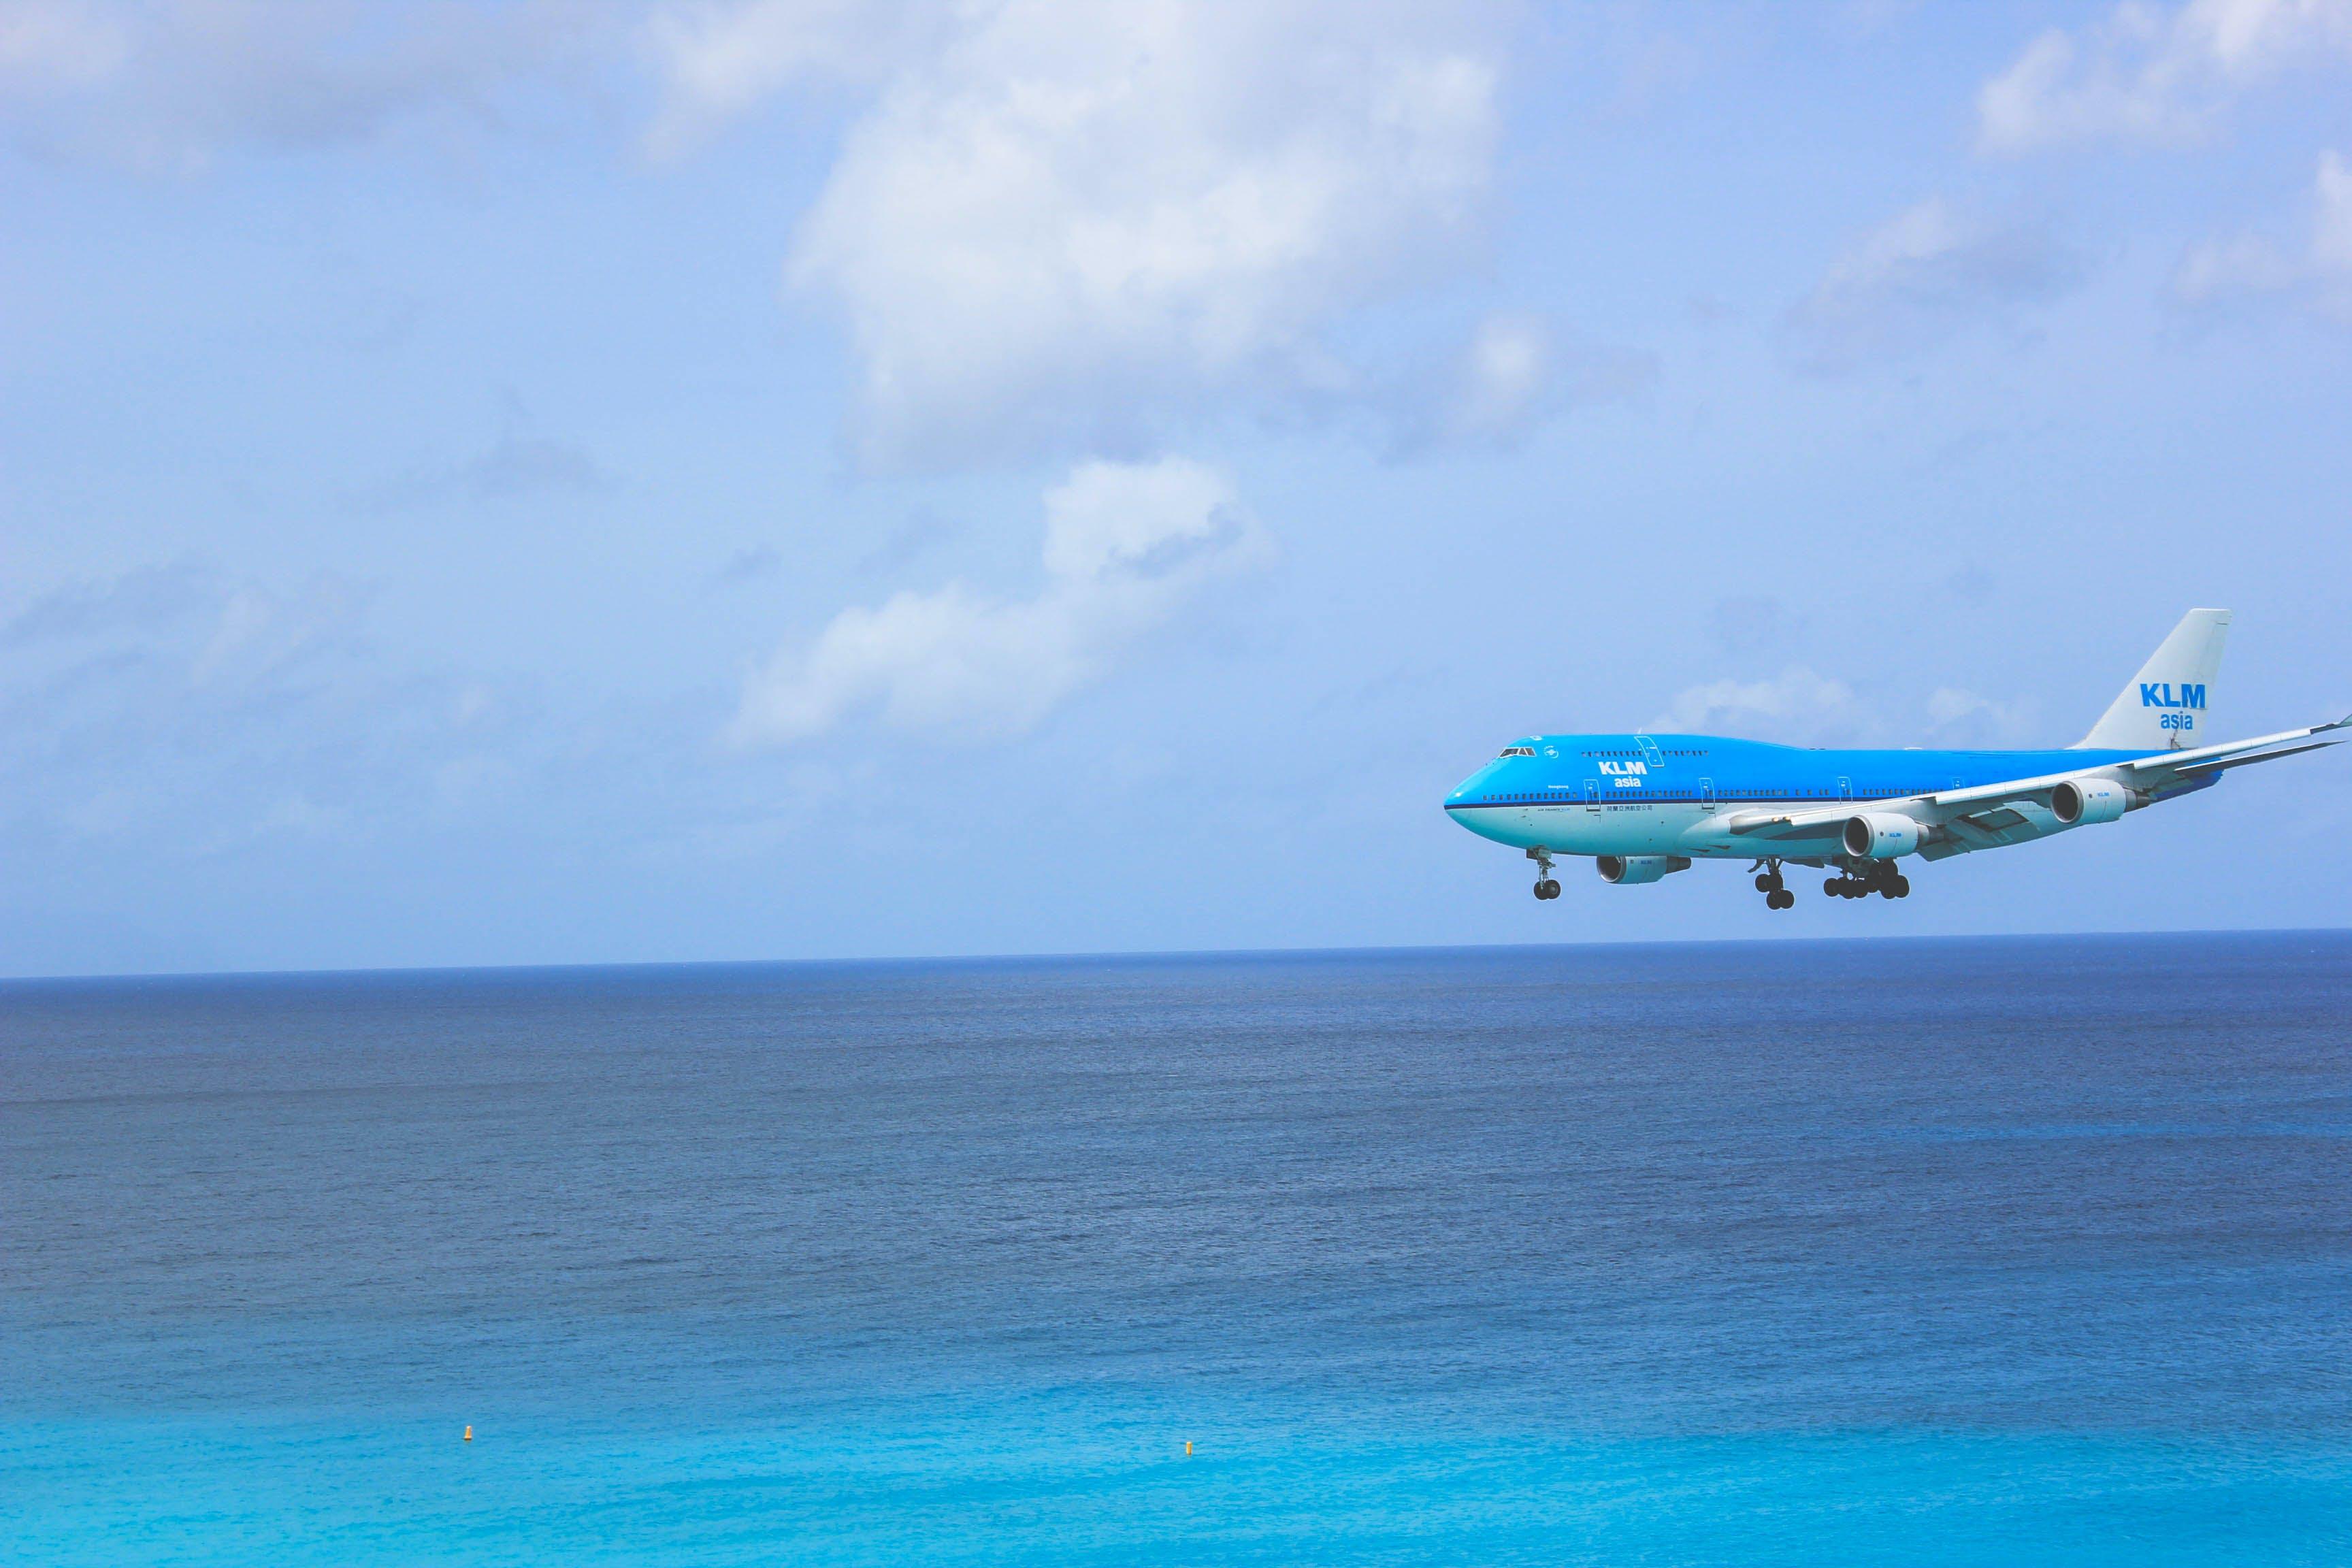 White and Blue Passenger Plane